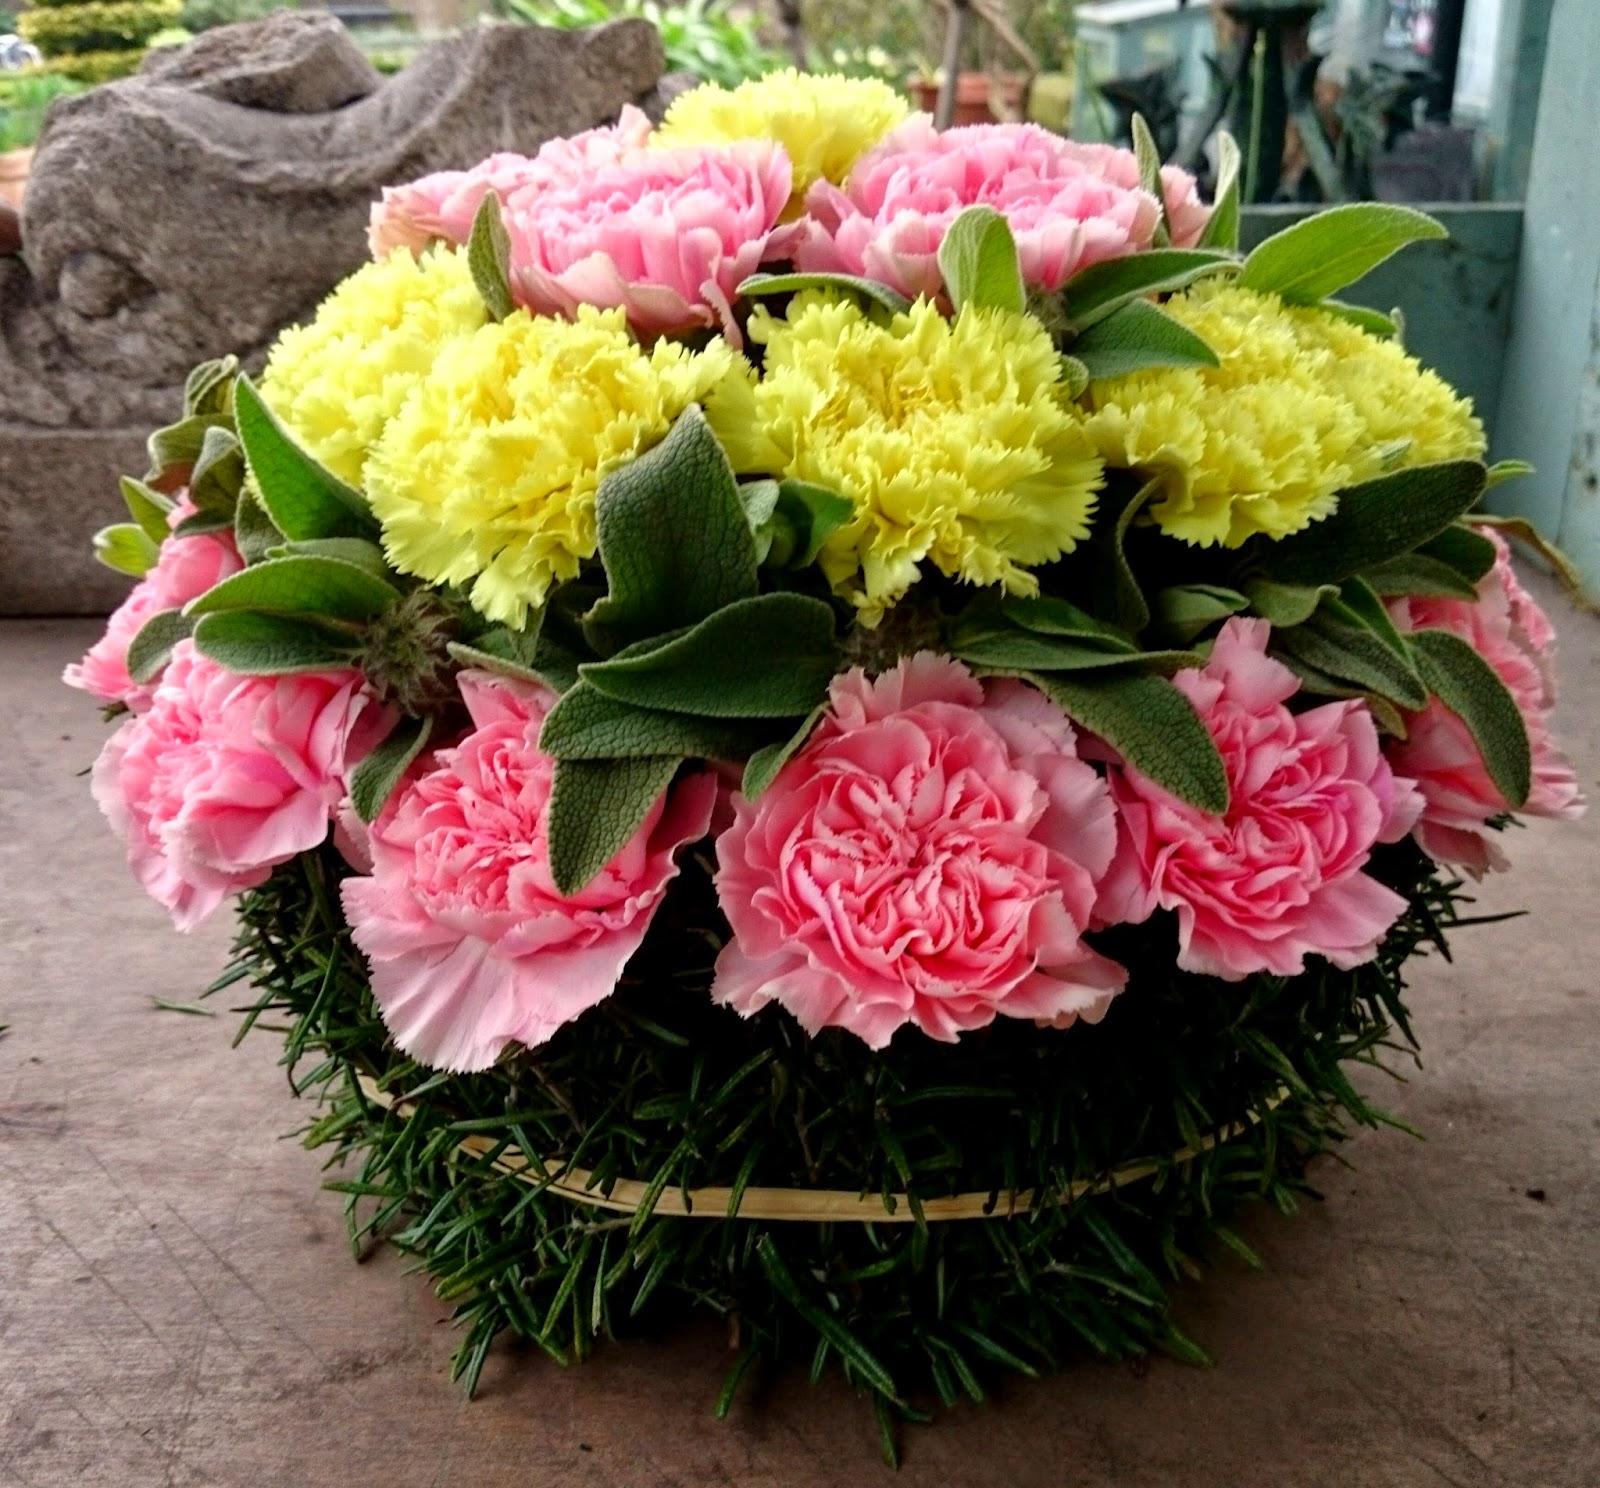 Giant Flower Bouquet Choice Image - Flower Wallpaper HD